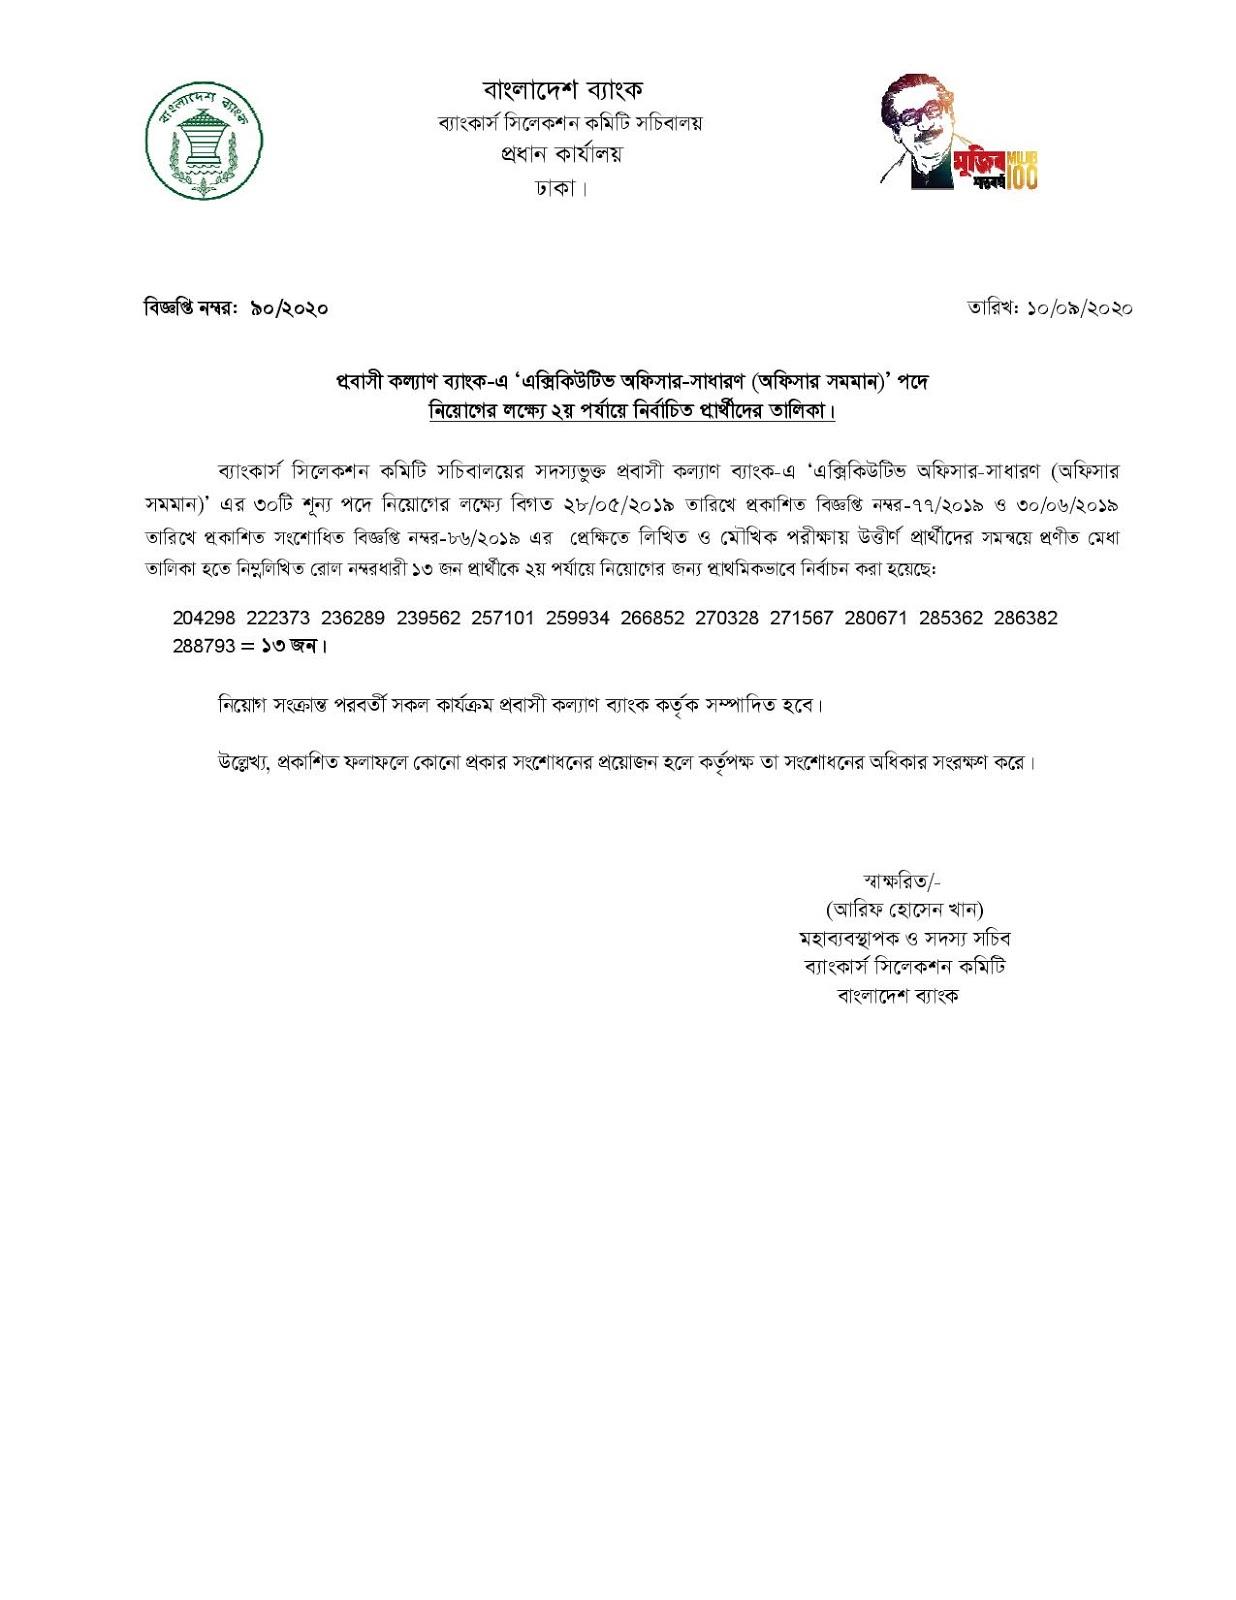 Bangladesh bank Job Exam Result